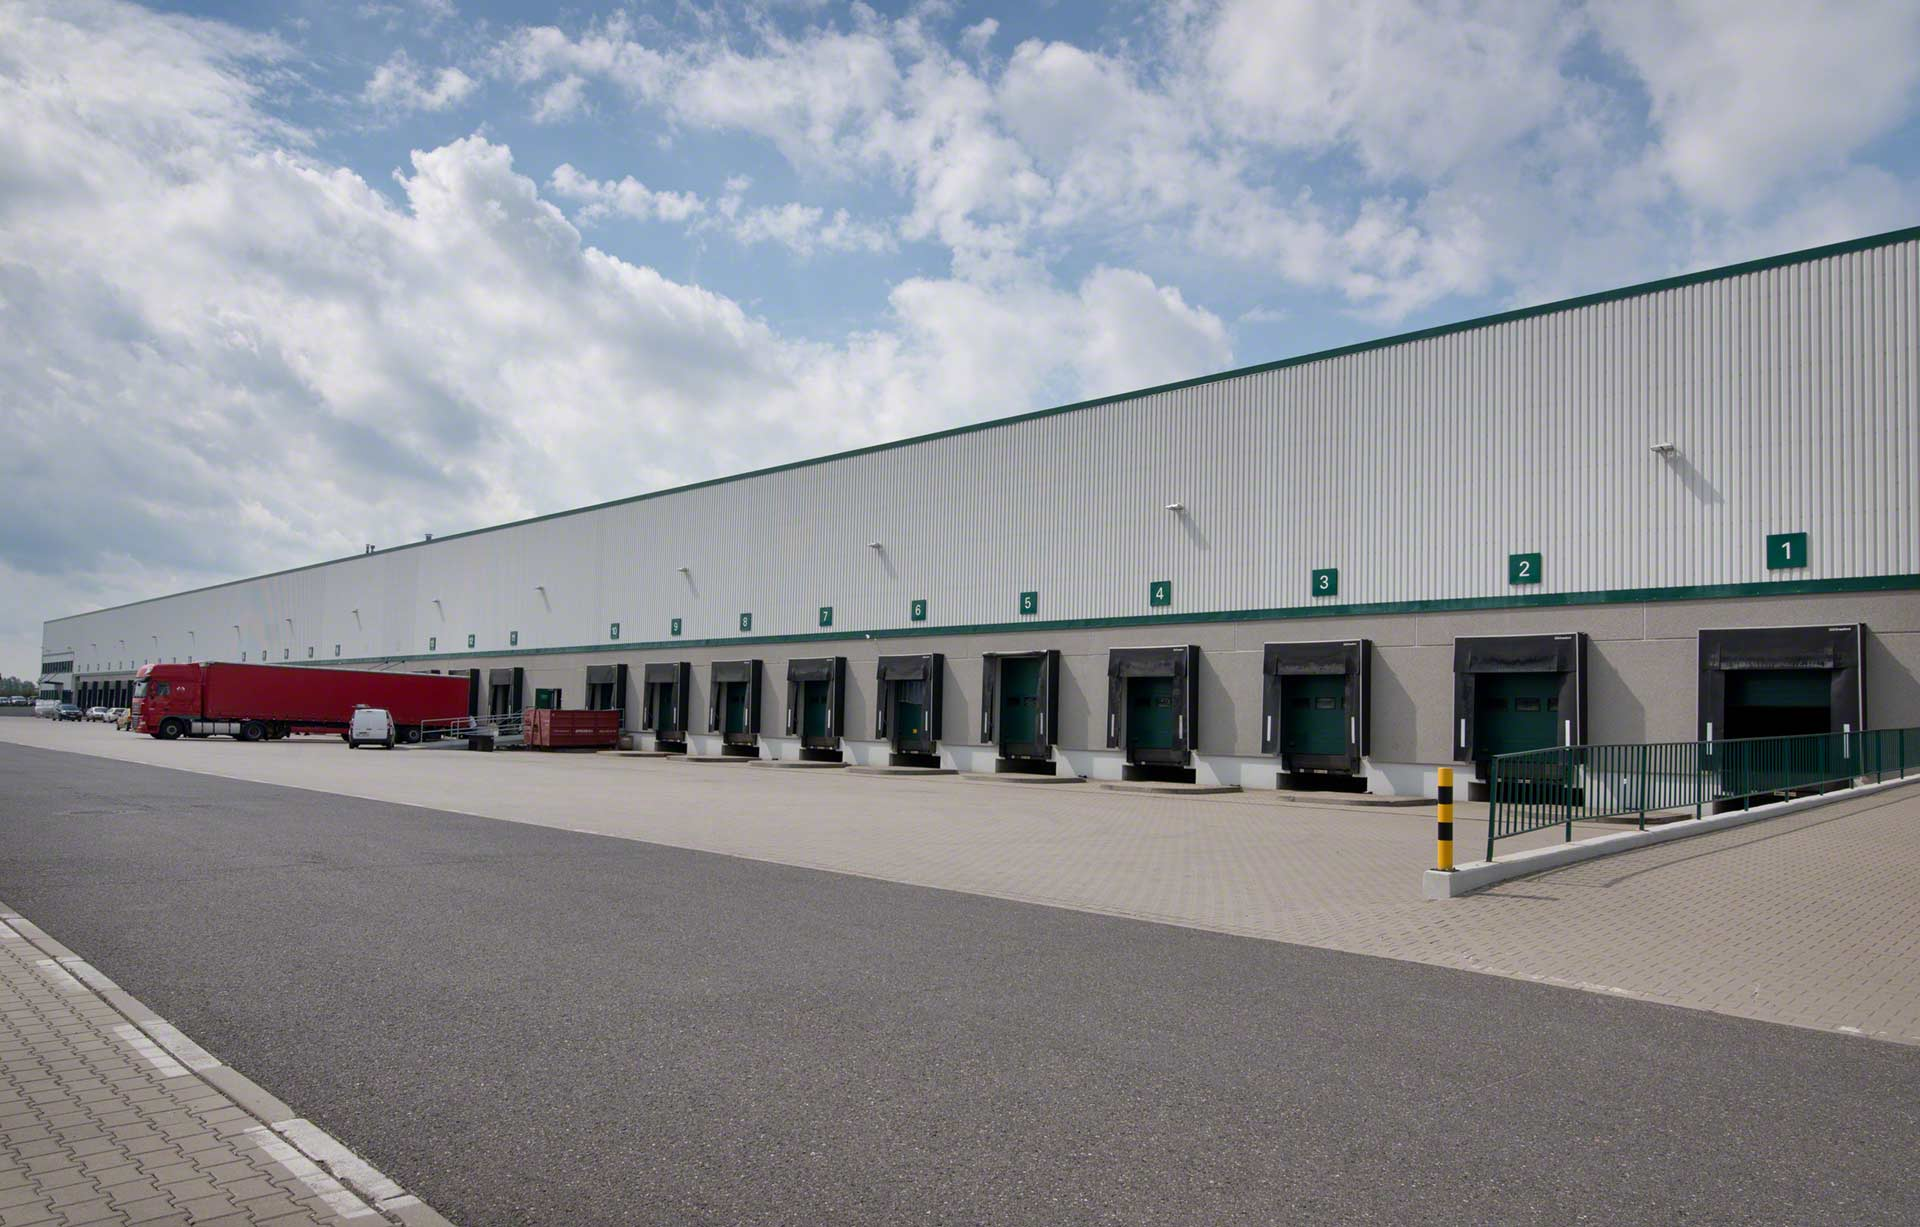 Distribution center: shortening delivery times, eradicating errors